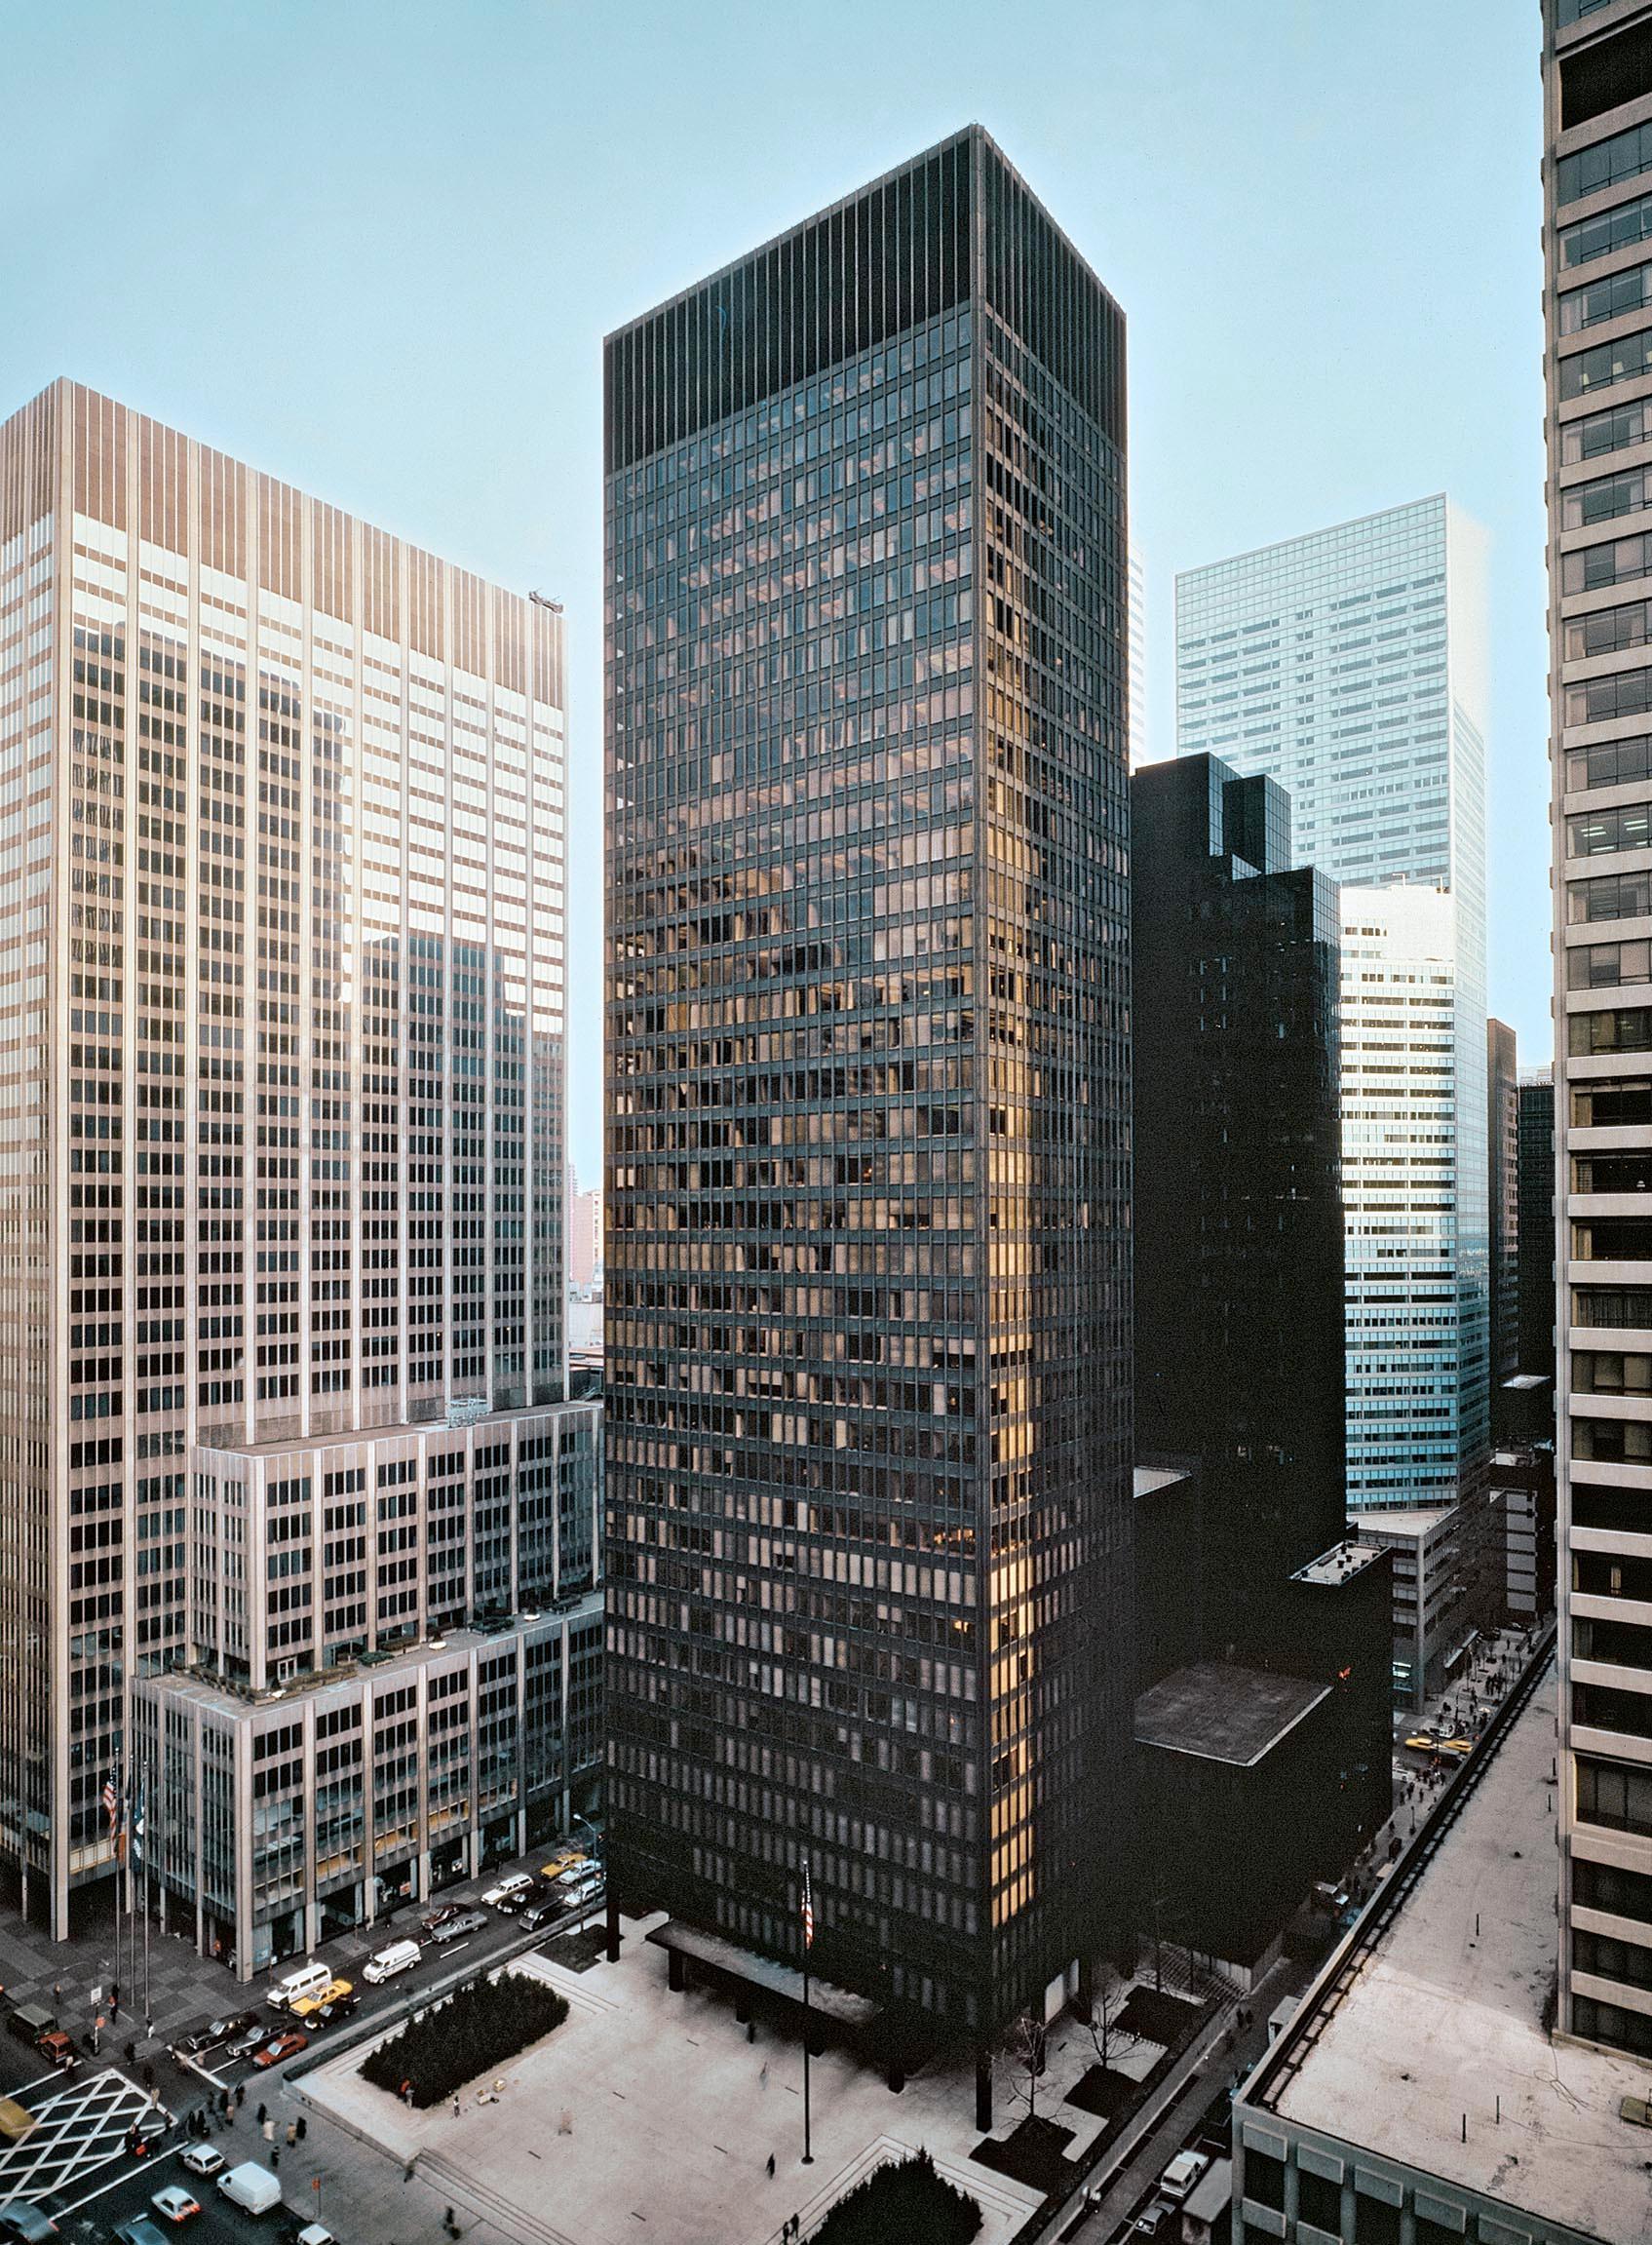 Seagram Building, Ludwig Mies van der Rohe, Philip Johnson